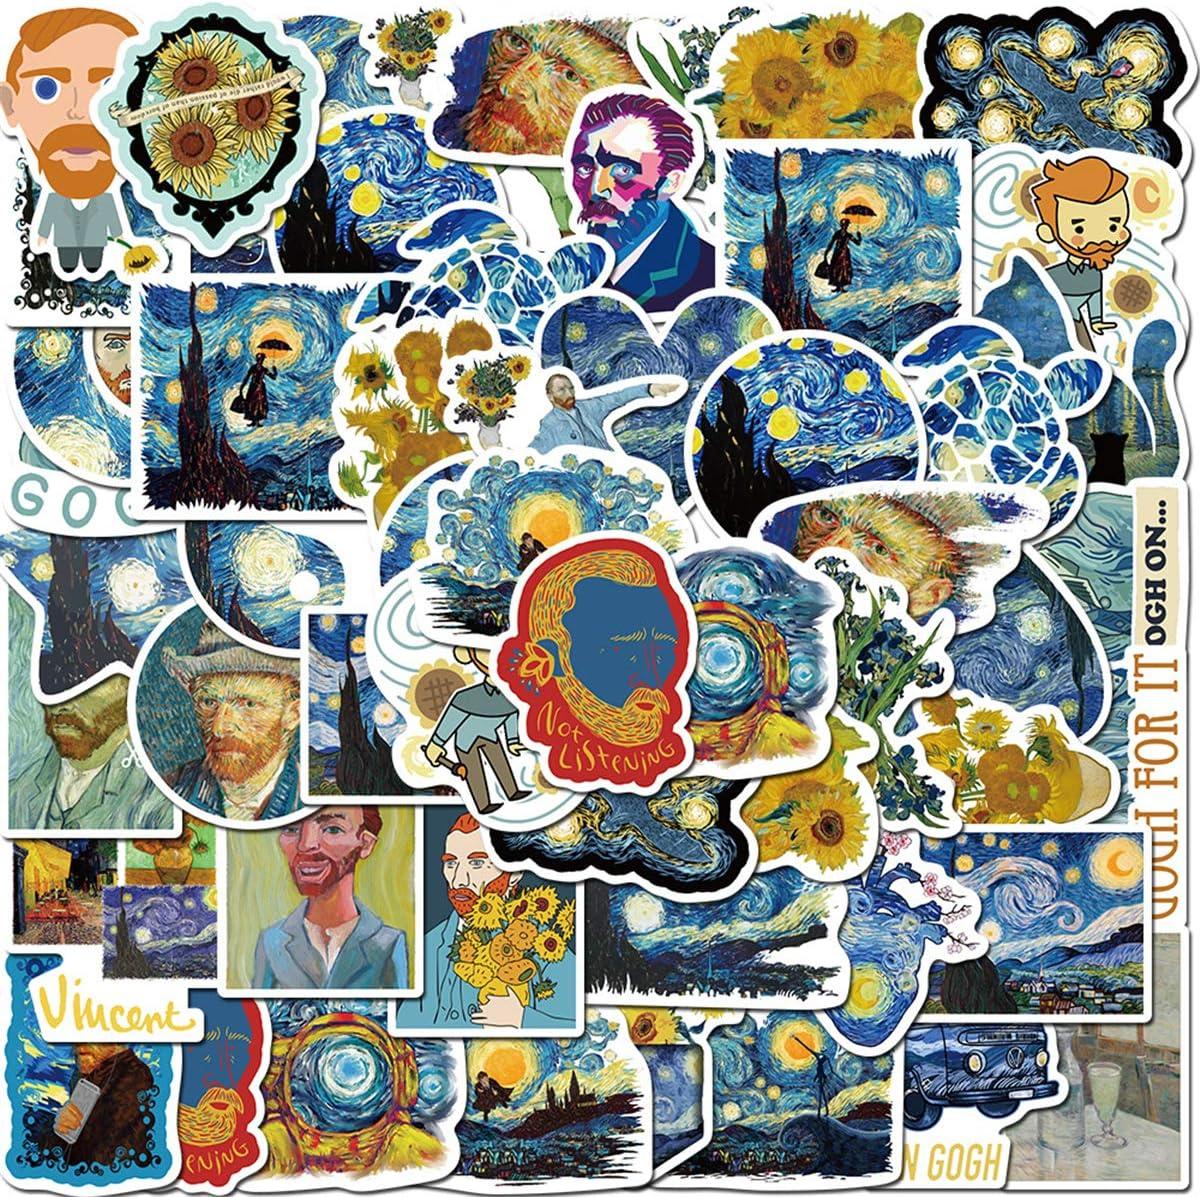 40pcs Van Gogh Stickers for Laptop Computer Stickers,Vinyl Waterproof Stickers Water Bottle Car Helmet Skateboard Luggage Bike Bumper Waterproof Graffiti Decals/Van Gogh